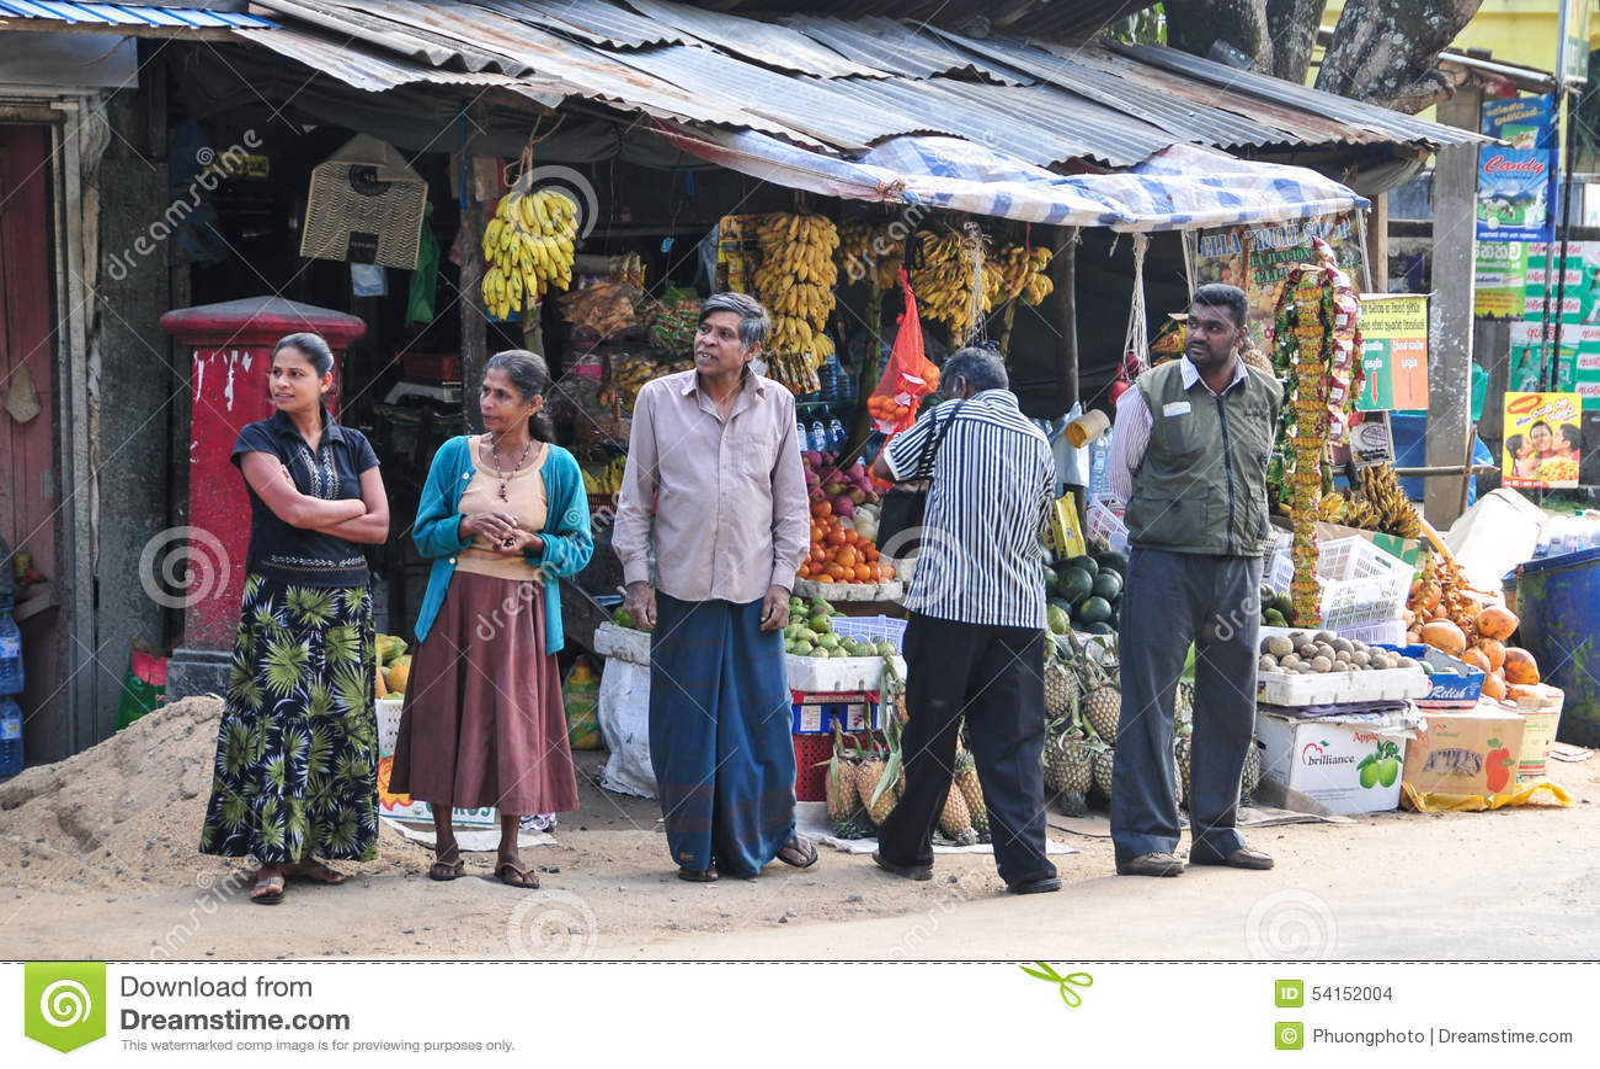 Sellers In Street Shop Sell Fresh Fruits In Sri Lanka